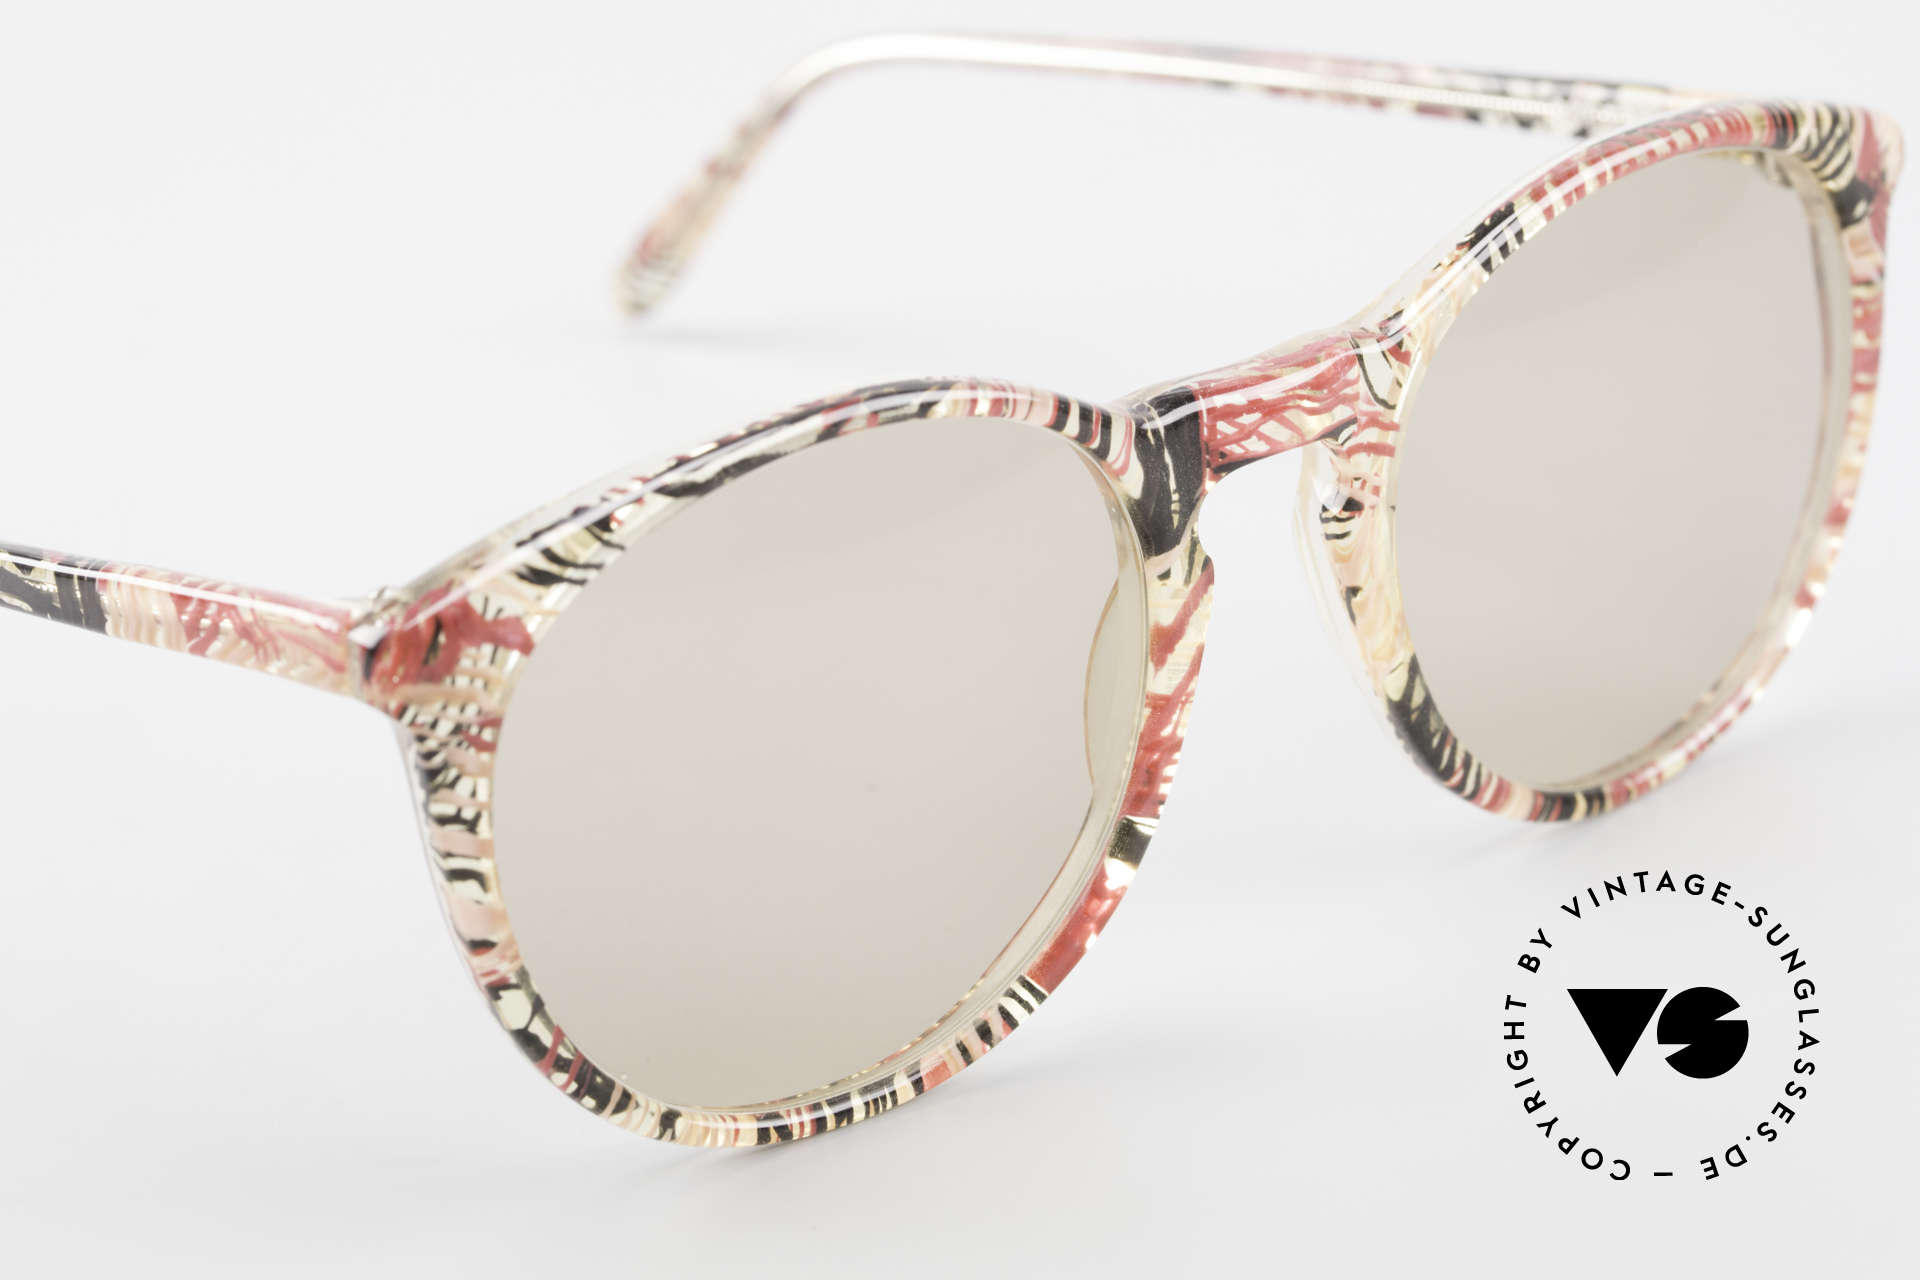 Alain Mikli 901 / 770 Panto Frame Crystal Patterned, never worn (like all our vintage Alain Mikli specs), Made for Men and Women